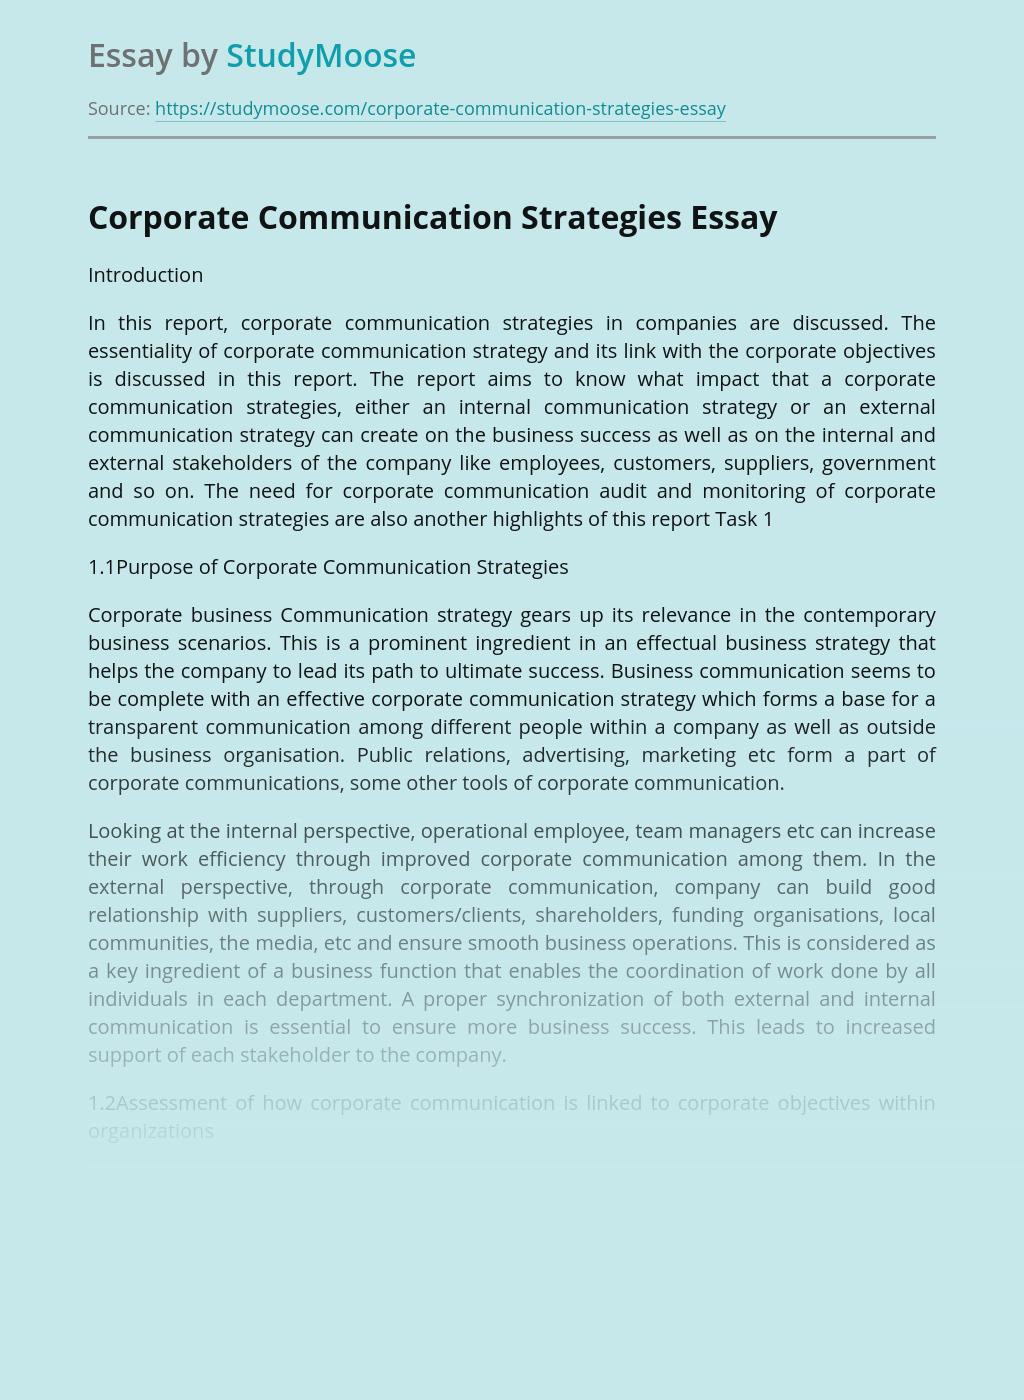 Corporate Communication Strategies